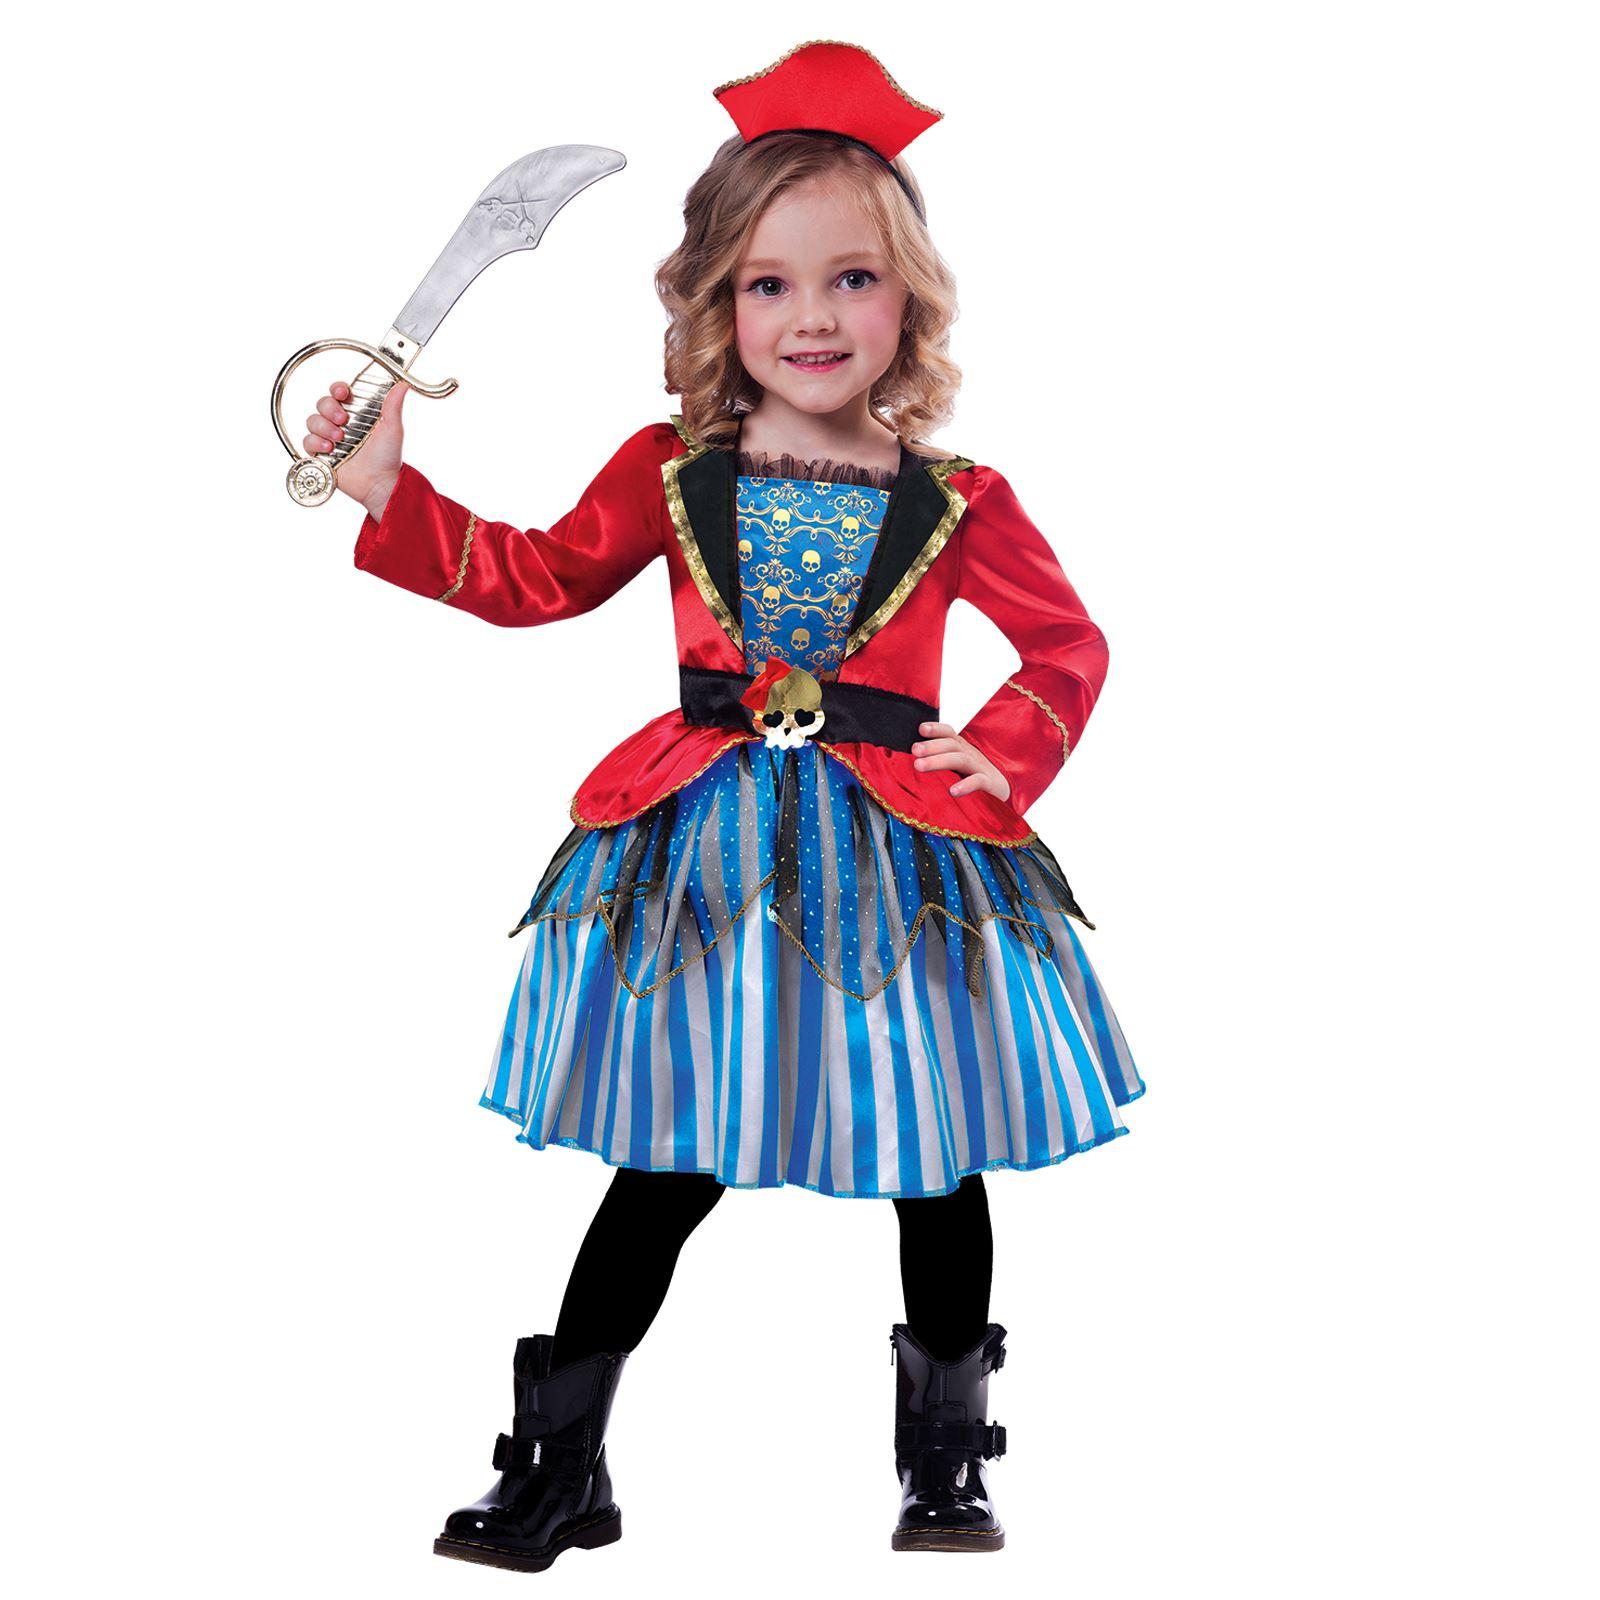 3ec0adae3cf Details about Kids Girls Toddlers Anchor Cutie Pirate Princess Fancy Dress  Book Week Costume